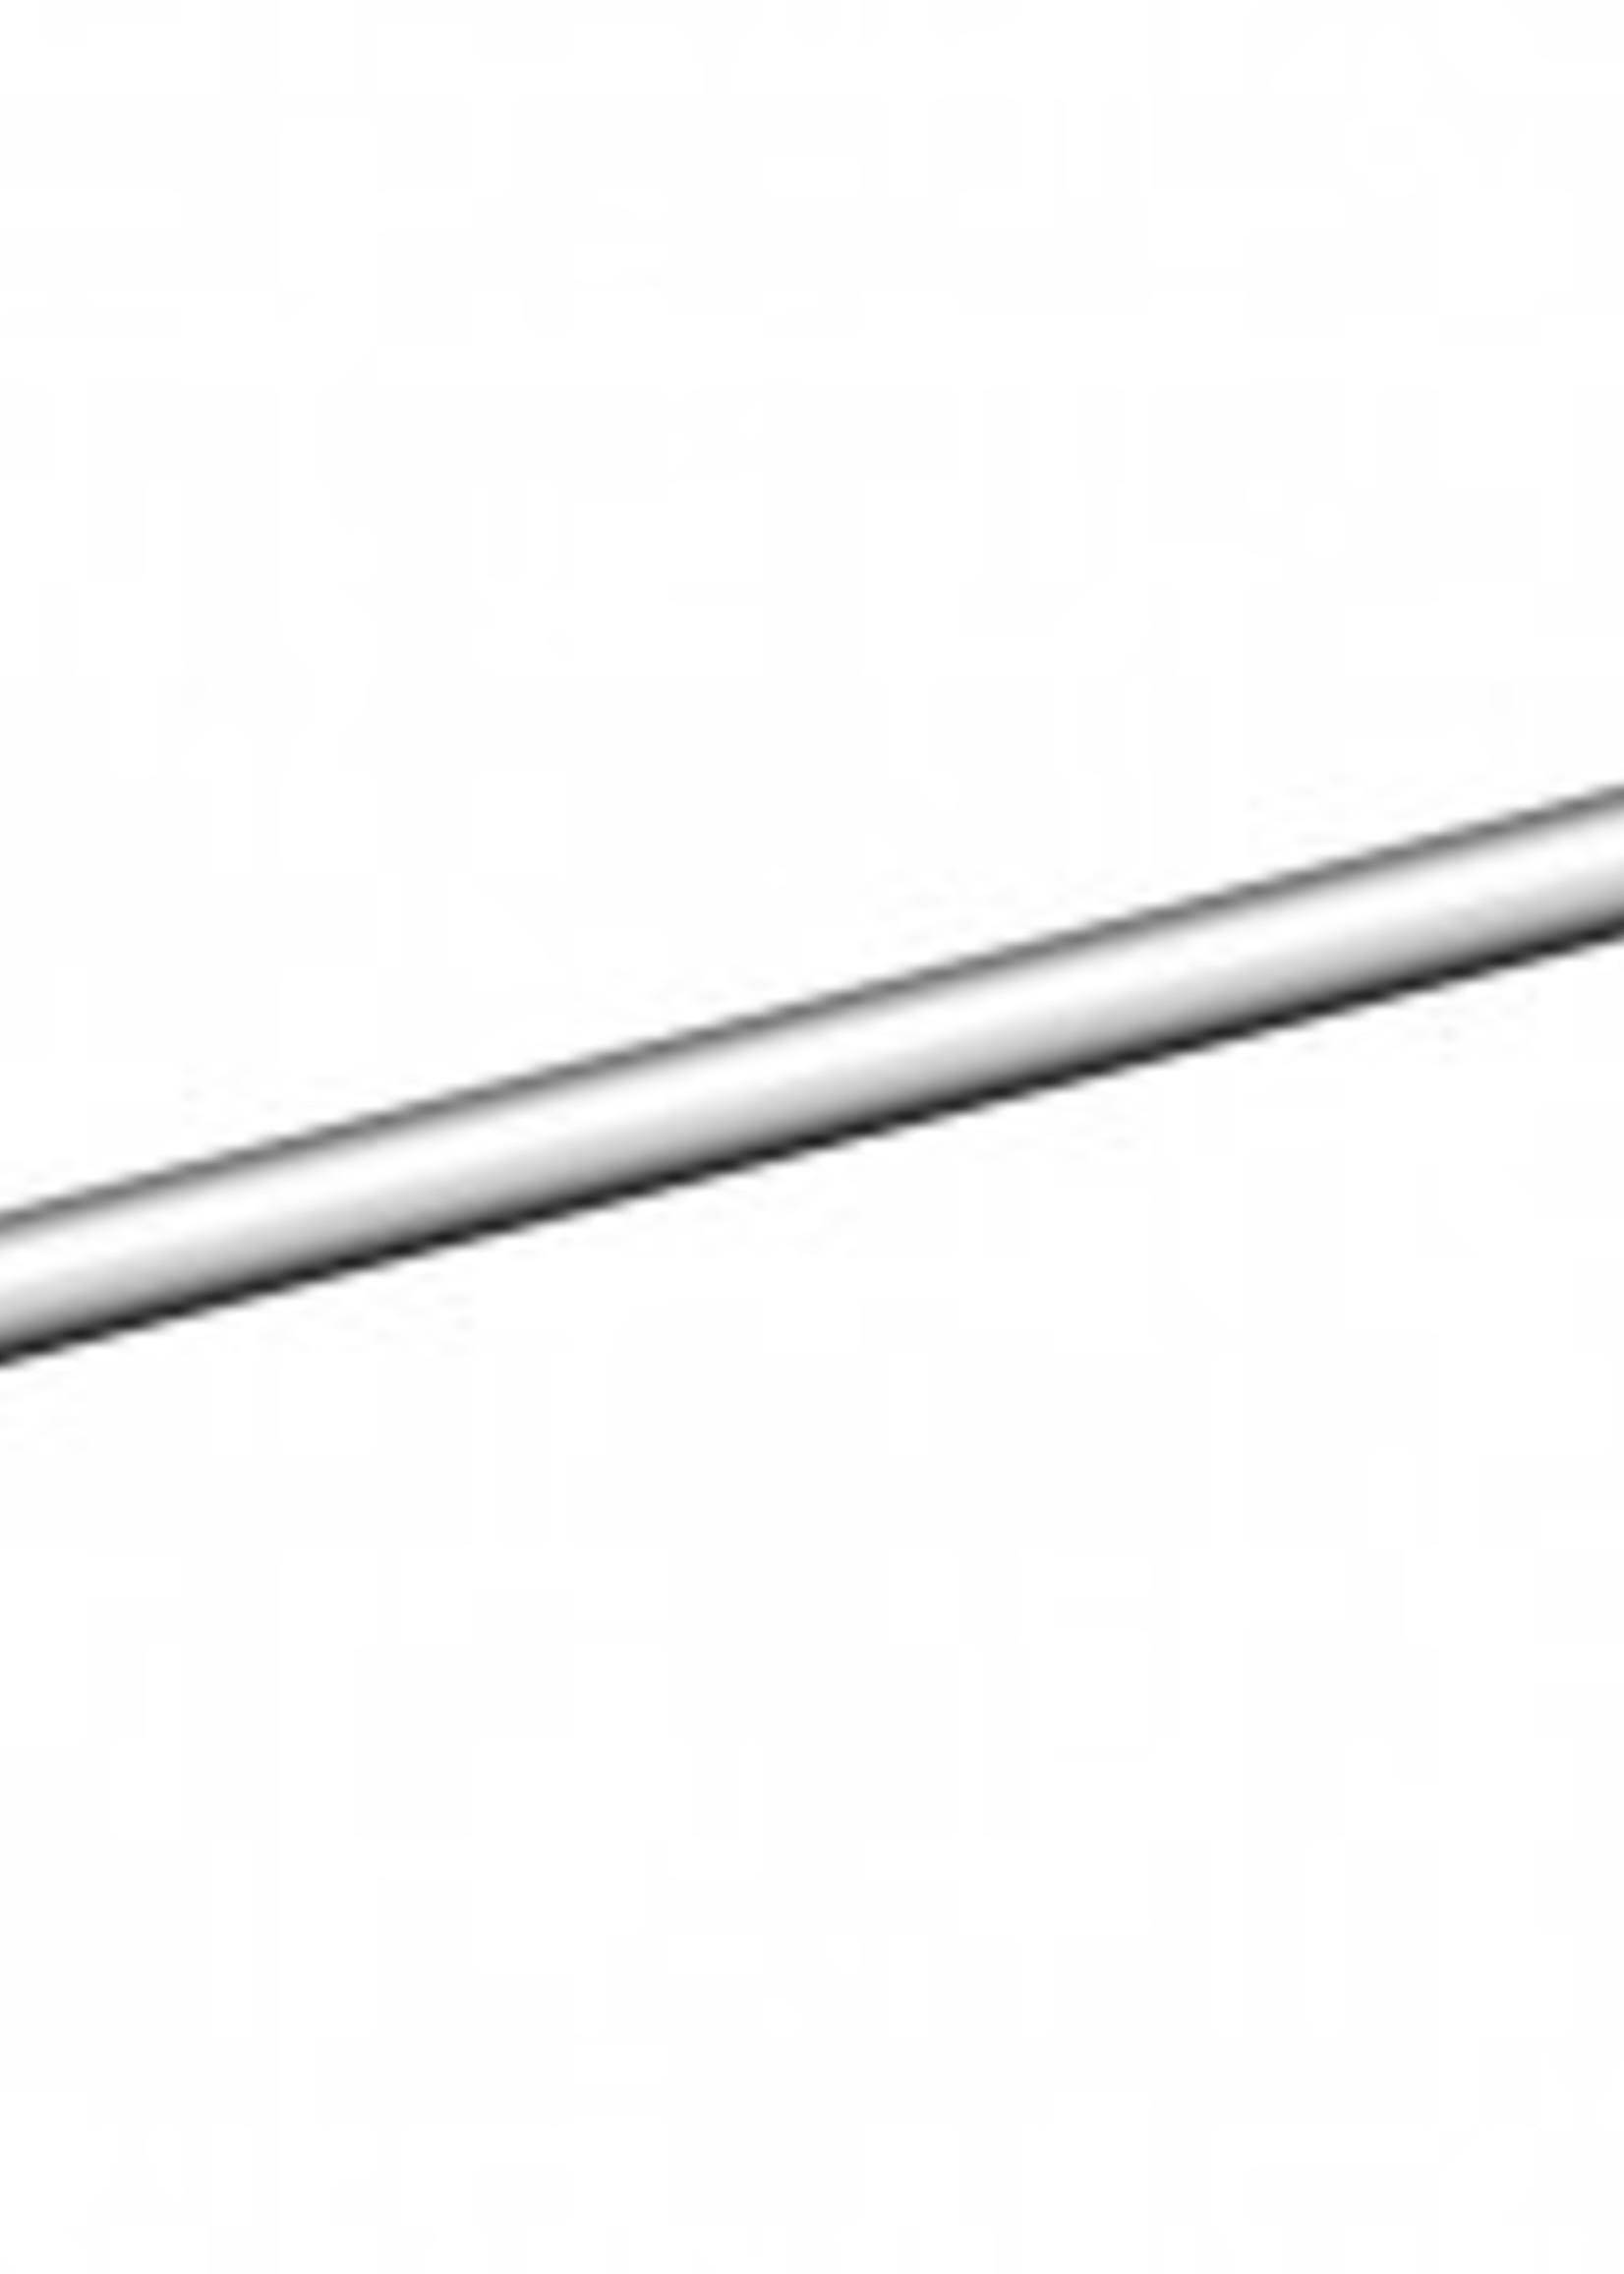 Layher Diagonaal 0.73 x 2.16 meter